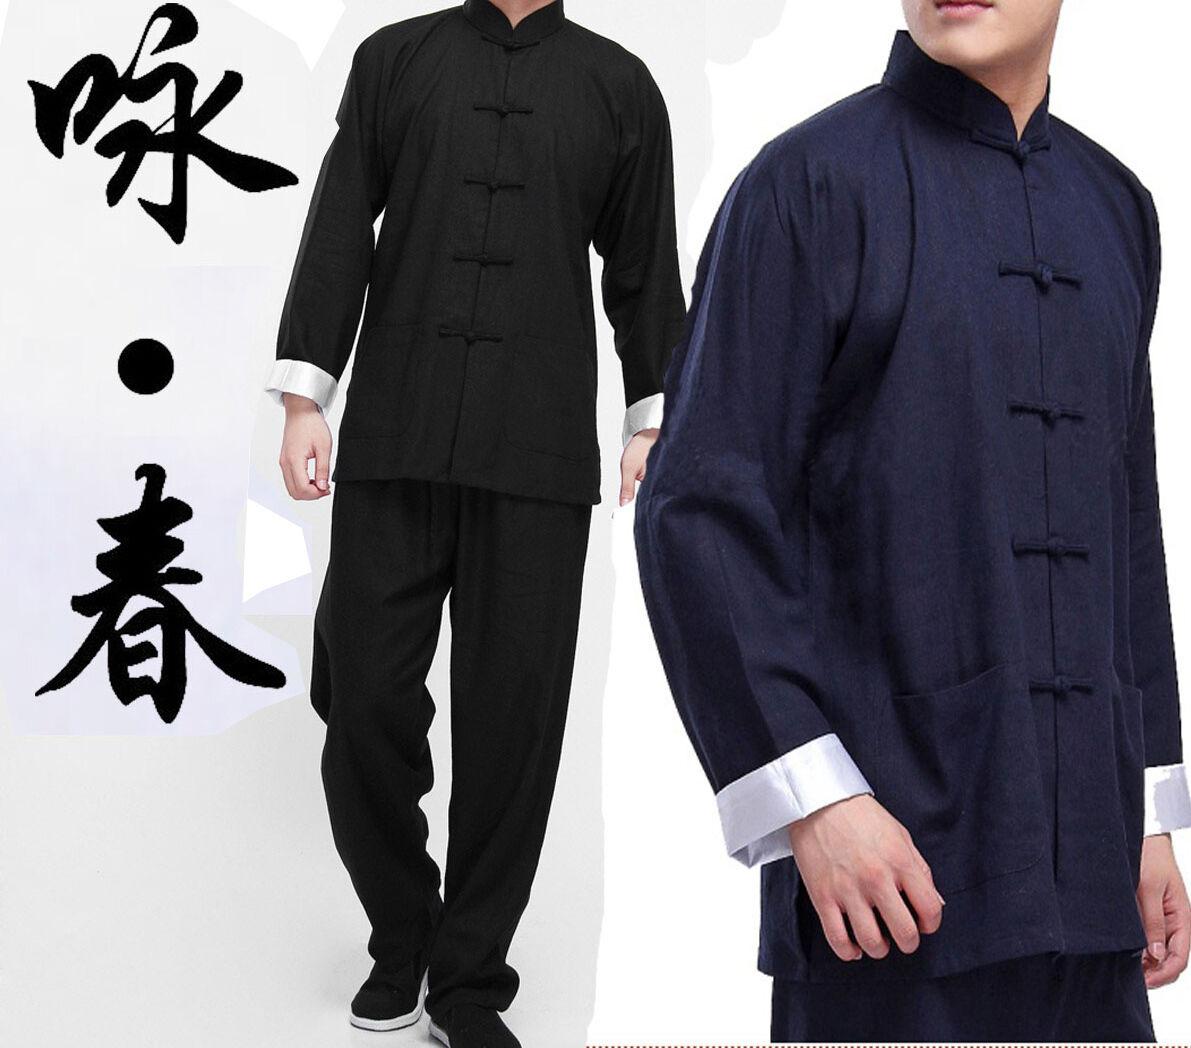 Comile  nese Kung Fu Wing Chun Suits Martial Tai   Uniform Bruce Lee Costume